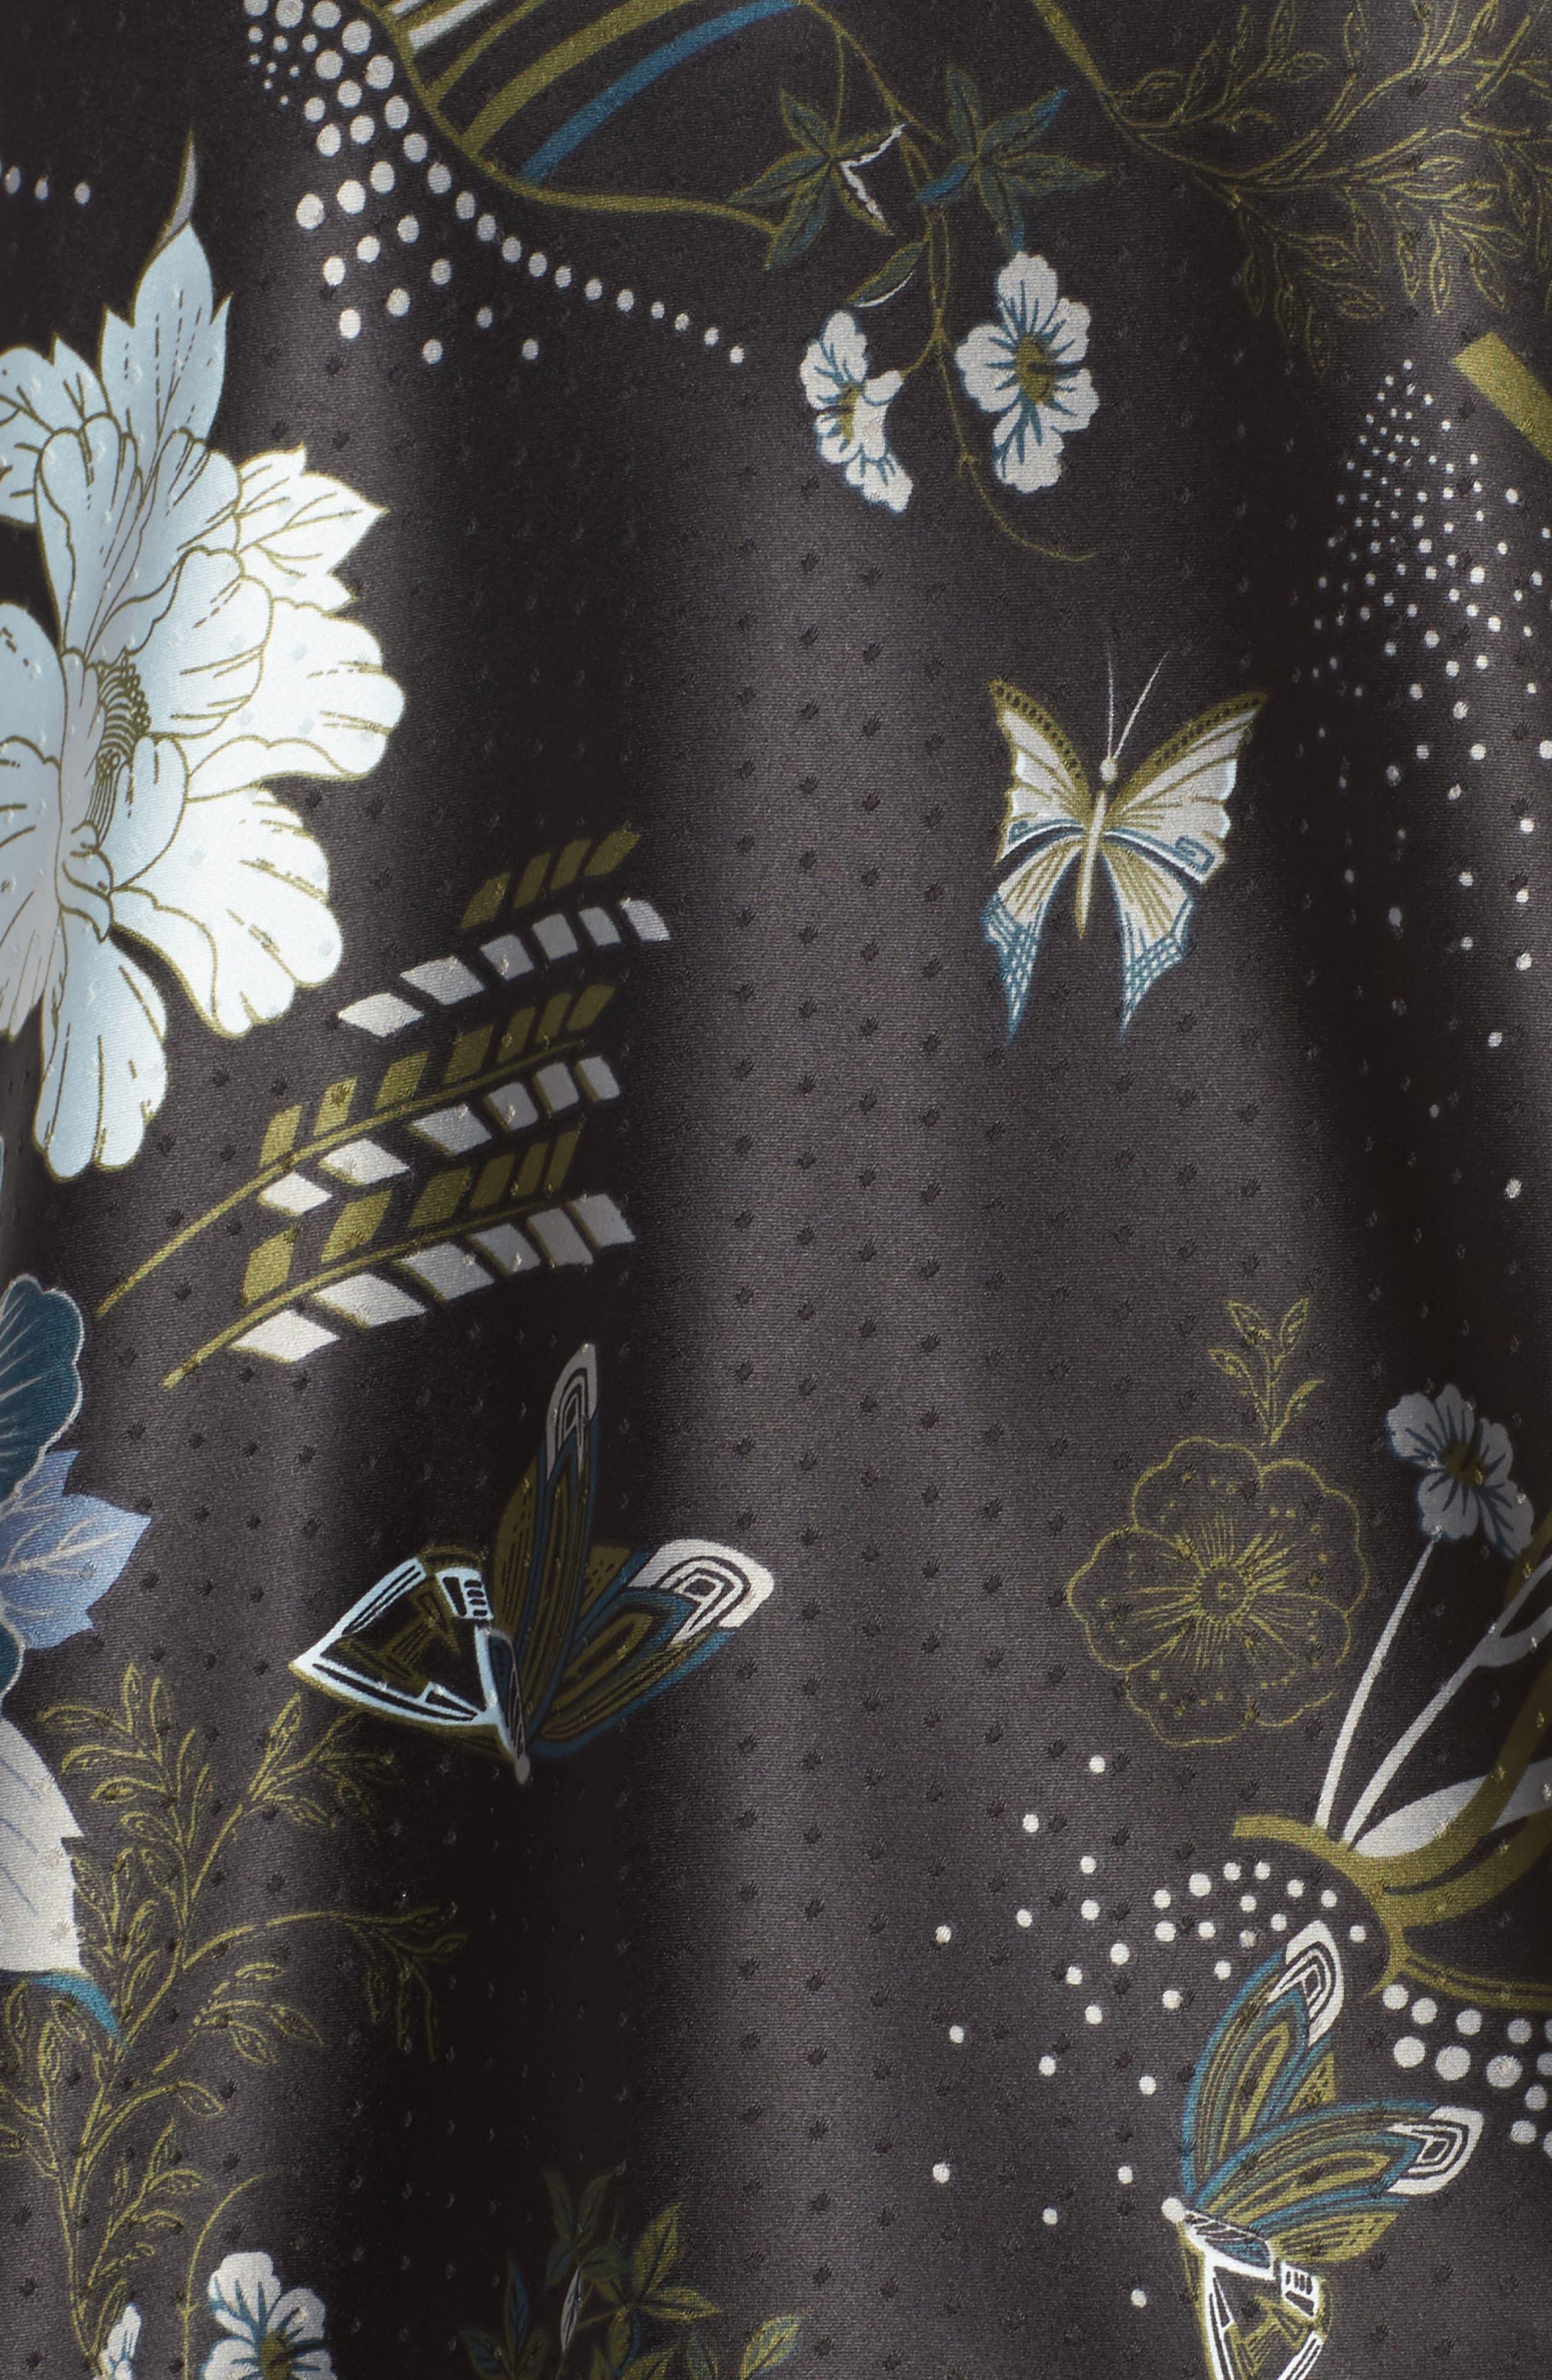 Late Nights Satin Camisole,                             Alternate thumbnail 7, color,                             Black Decorative Scenery